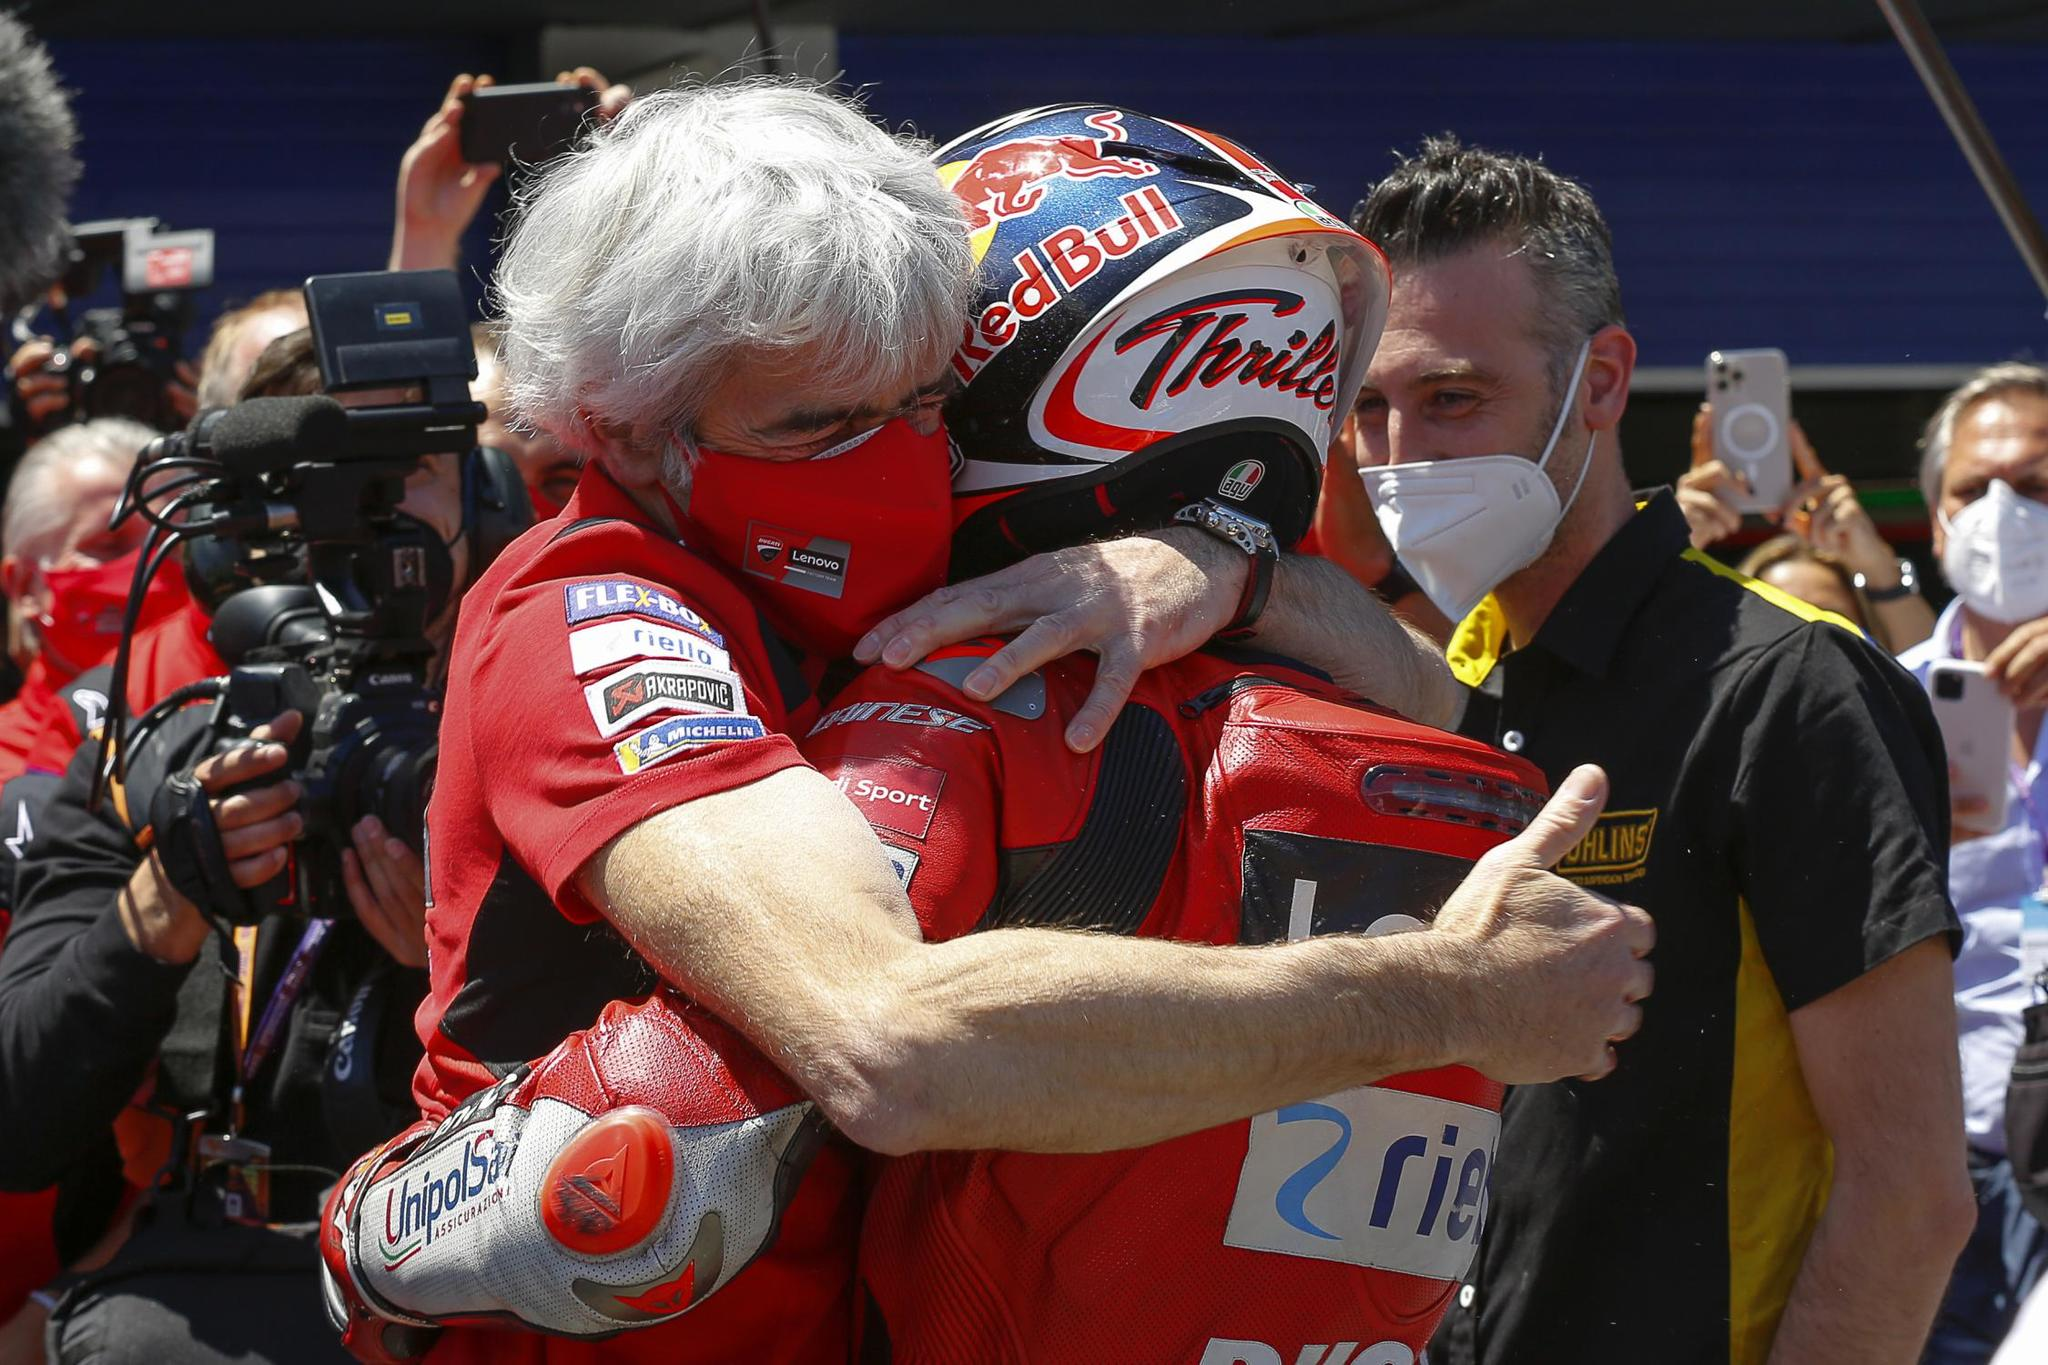 Dall'Igna abraza a Miller.